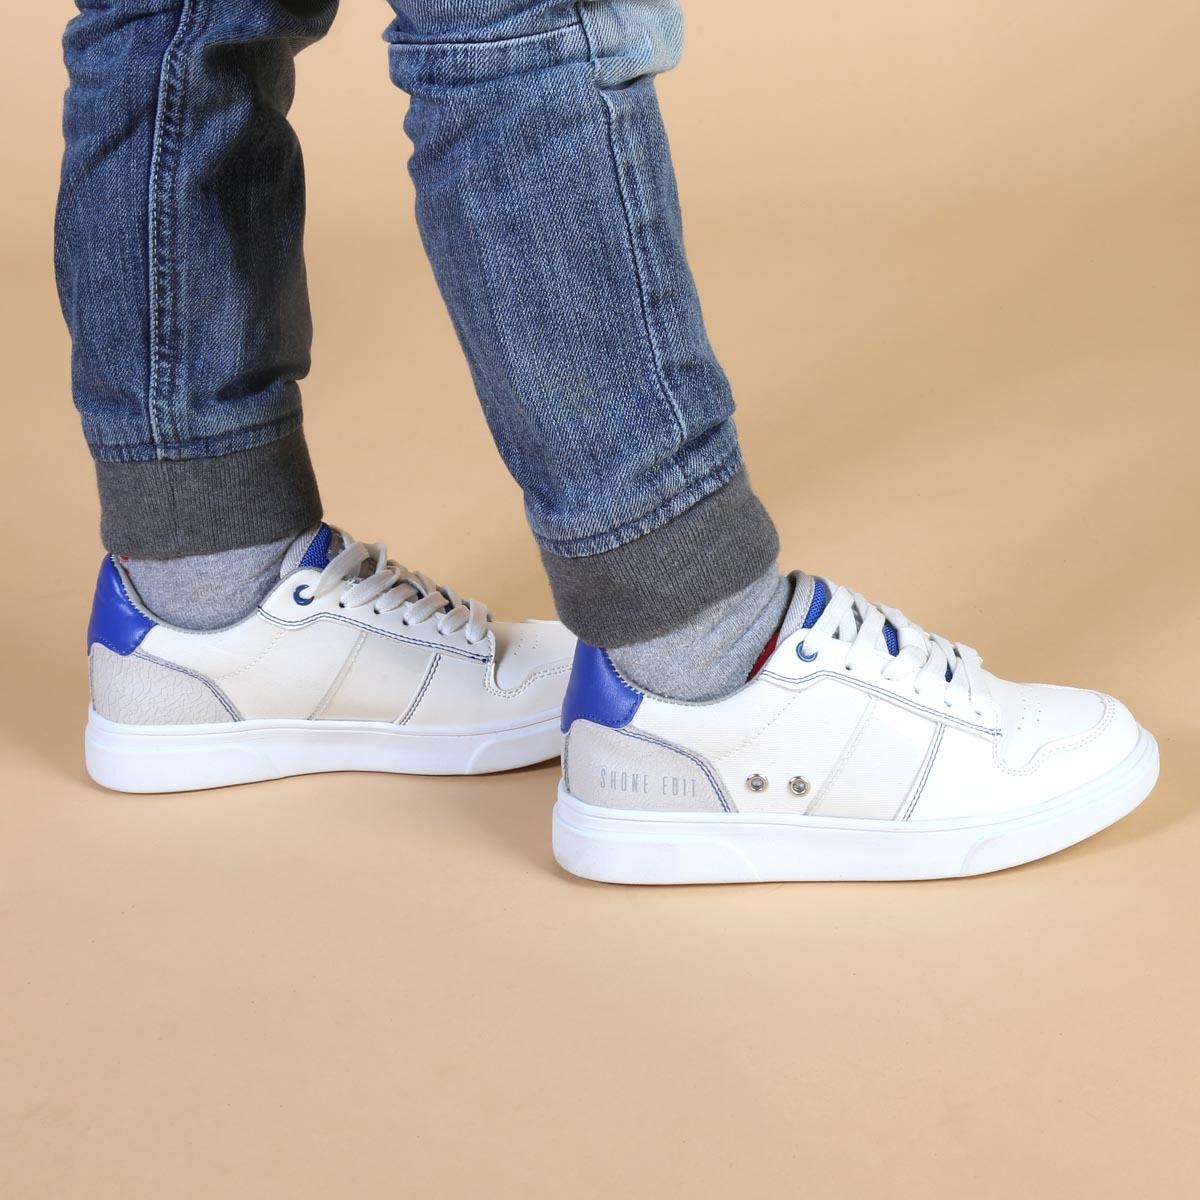 Pantofi sport Shone S8015-013 Alb